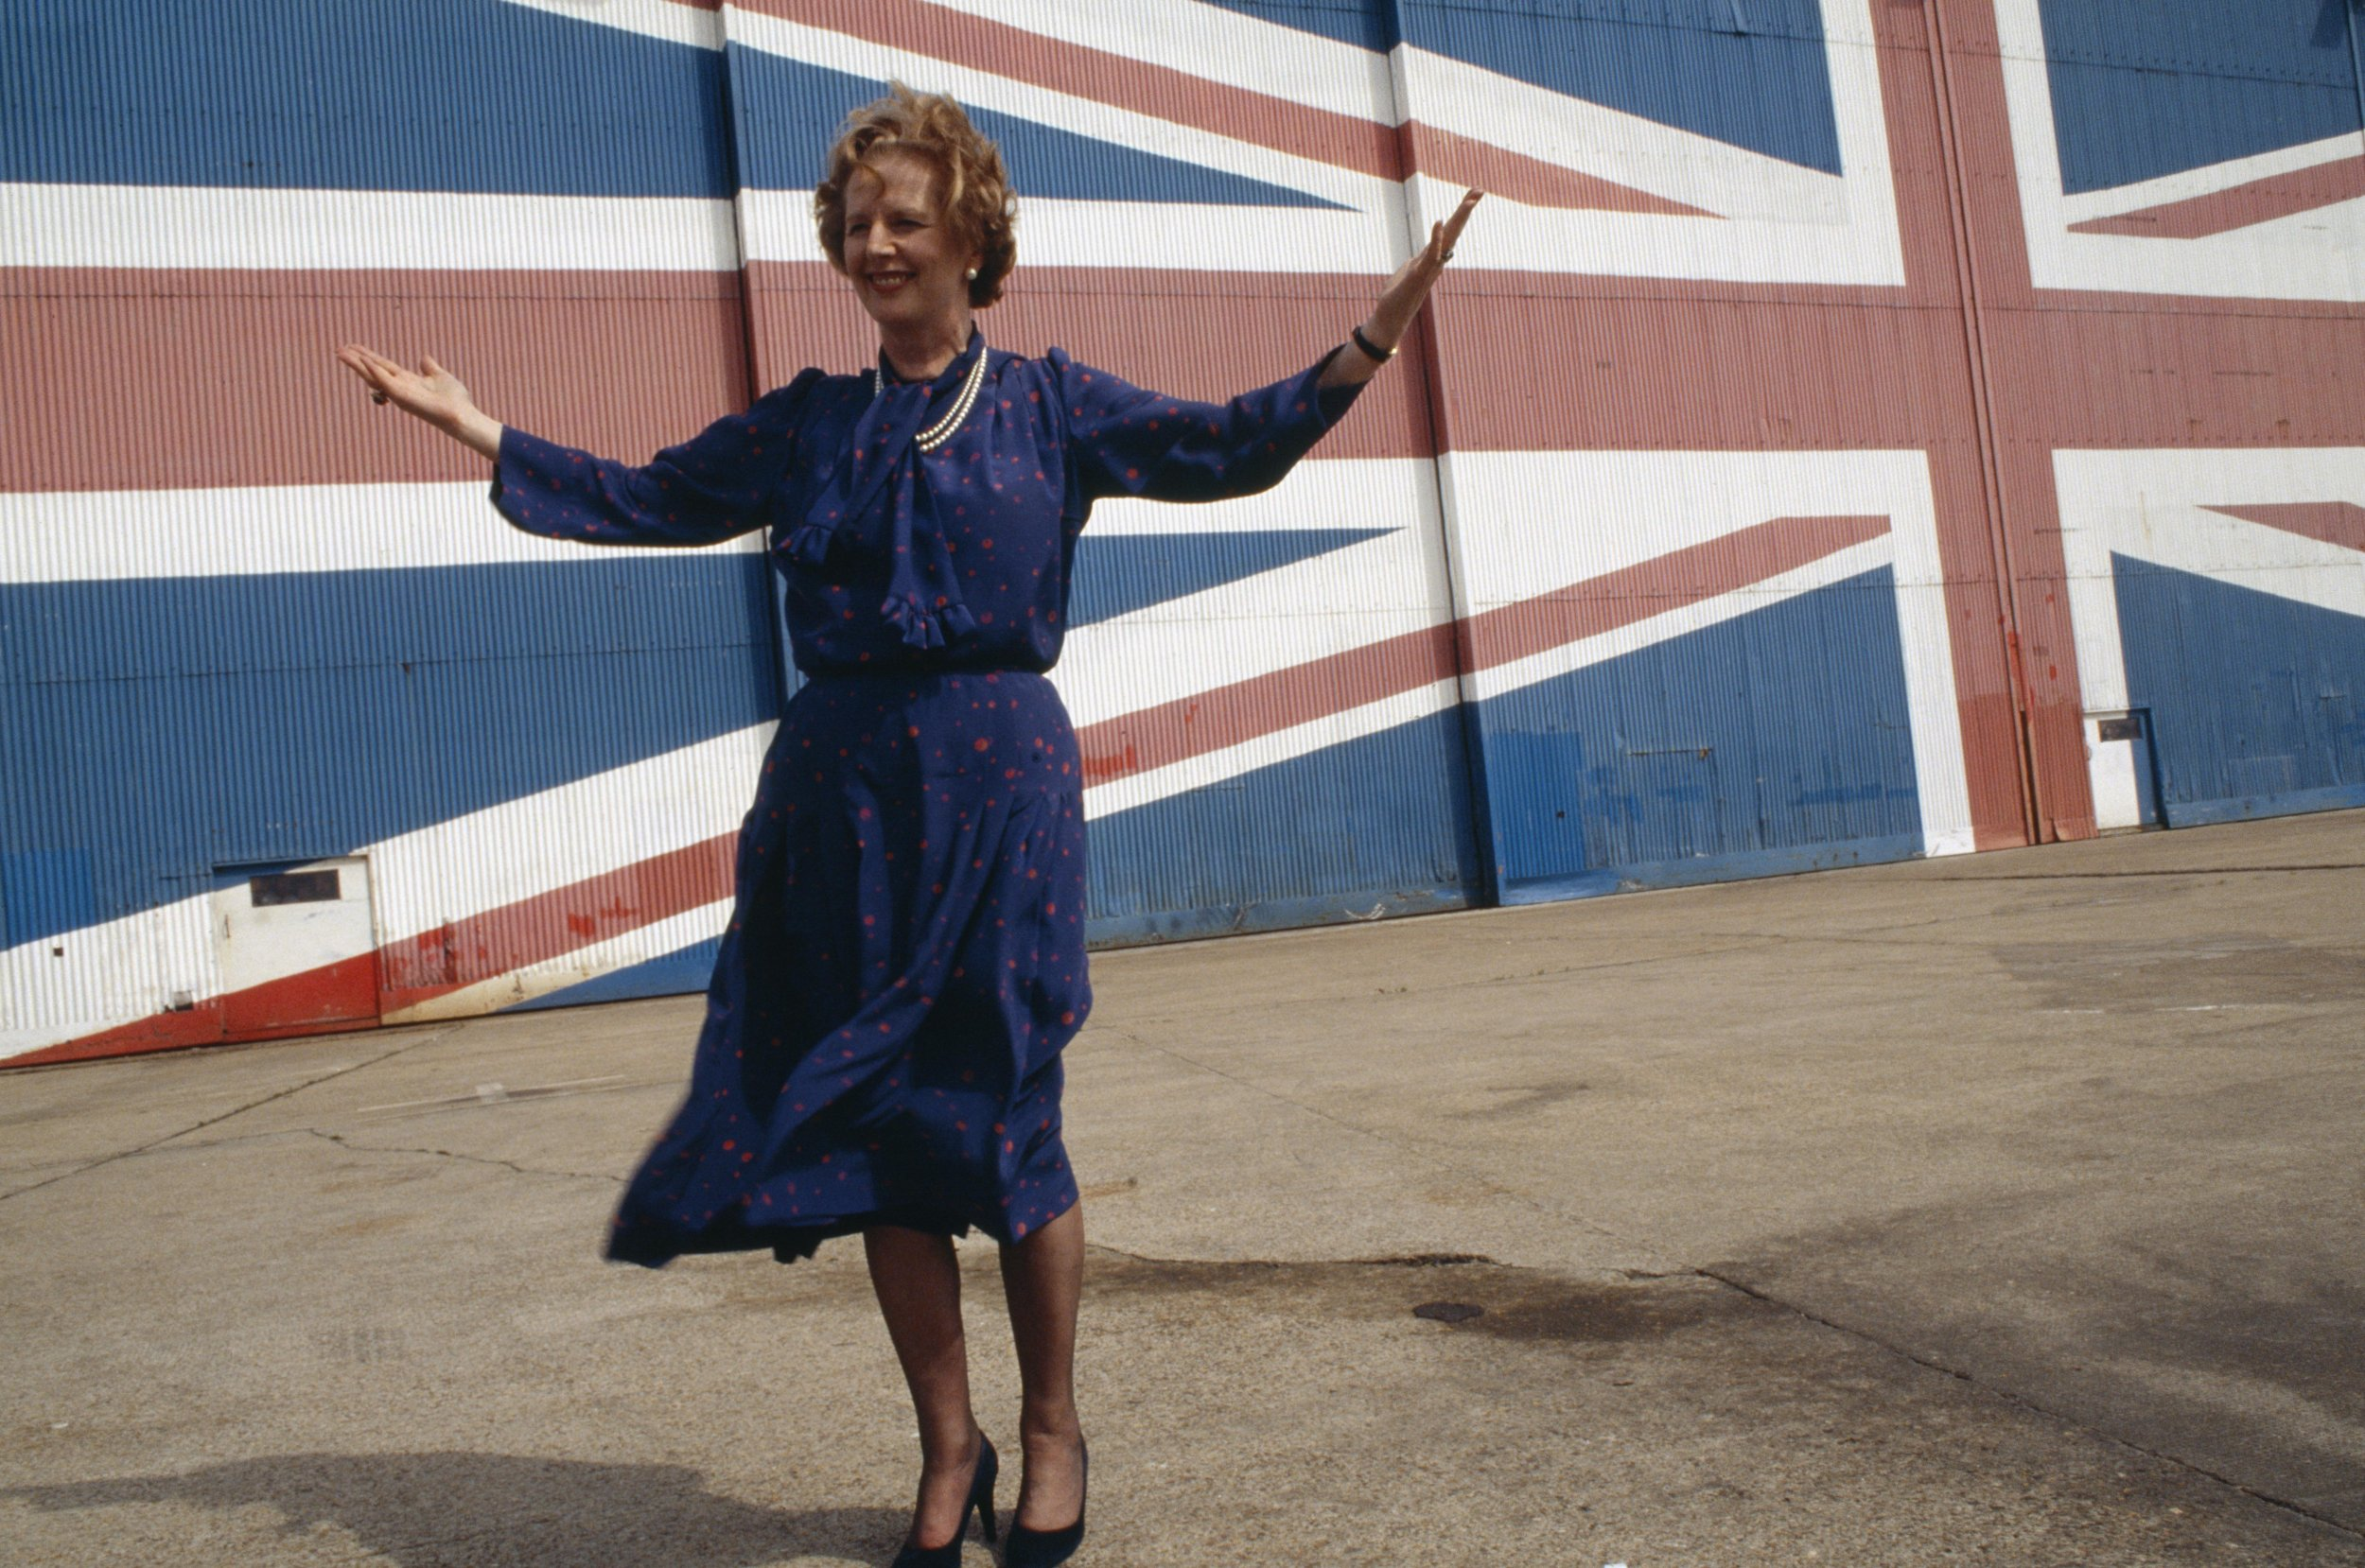 Thatcher launching manifesto